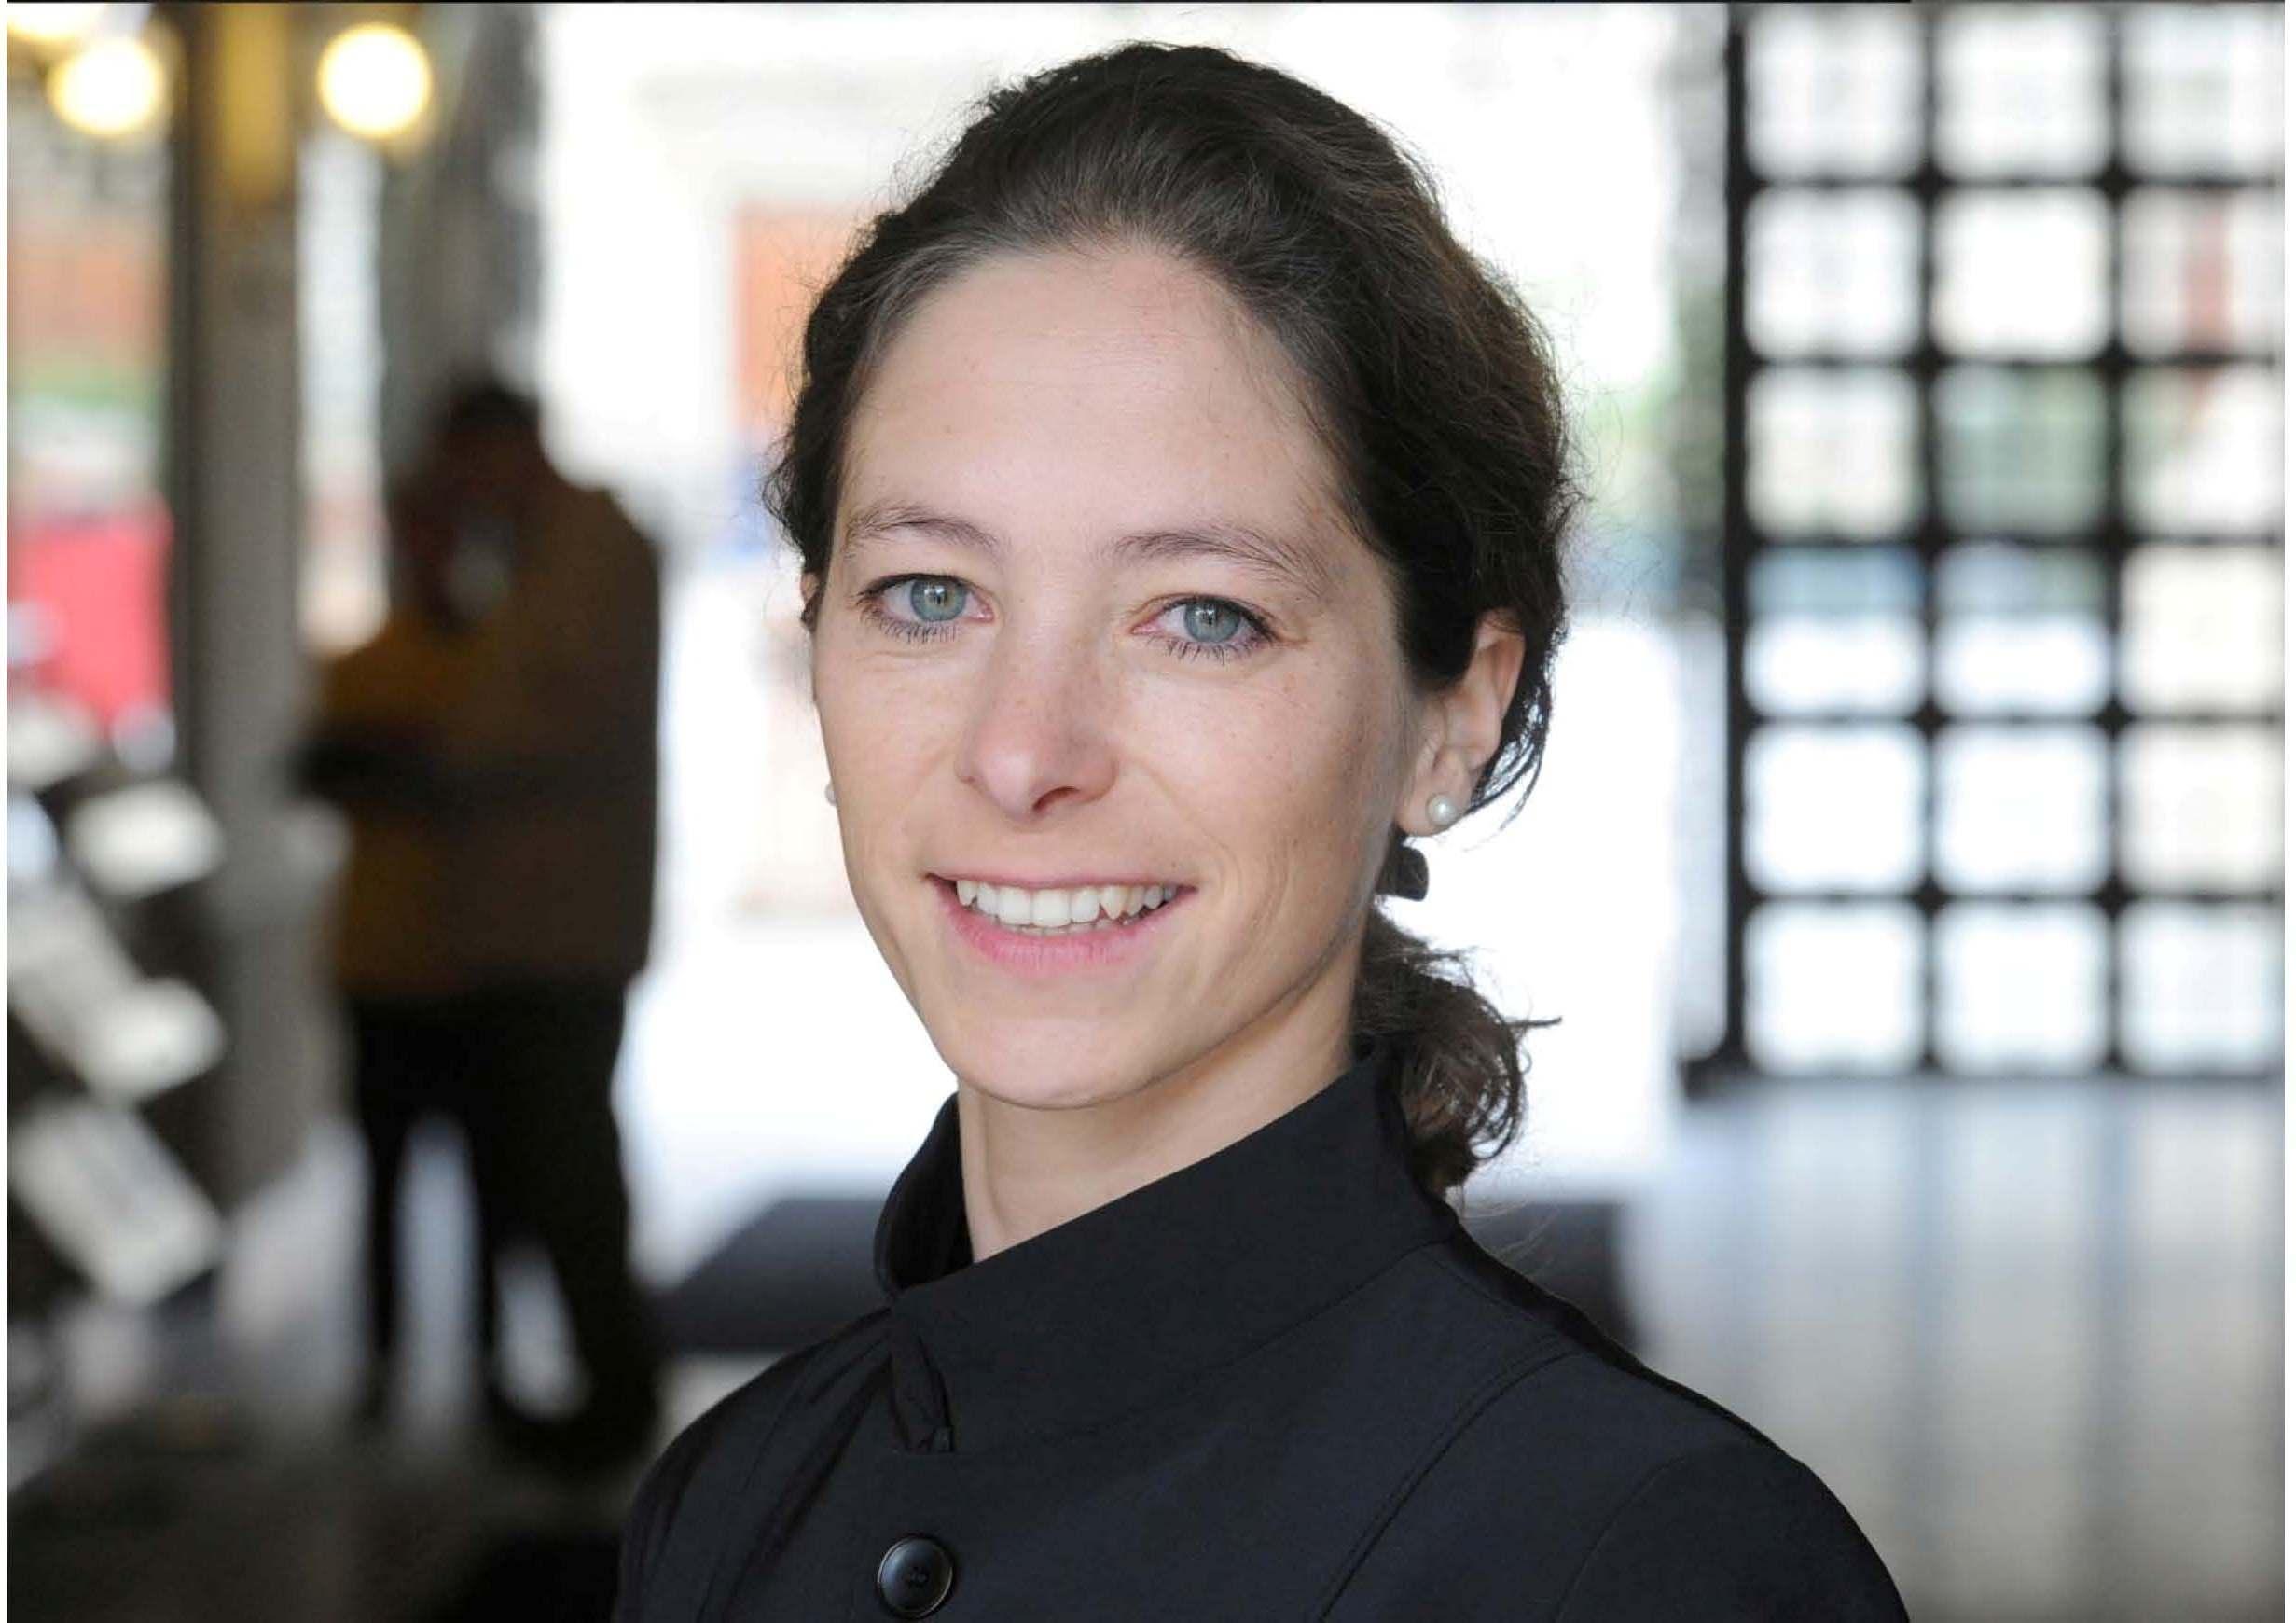 Dr. Mandy Pastohr